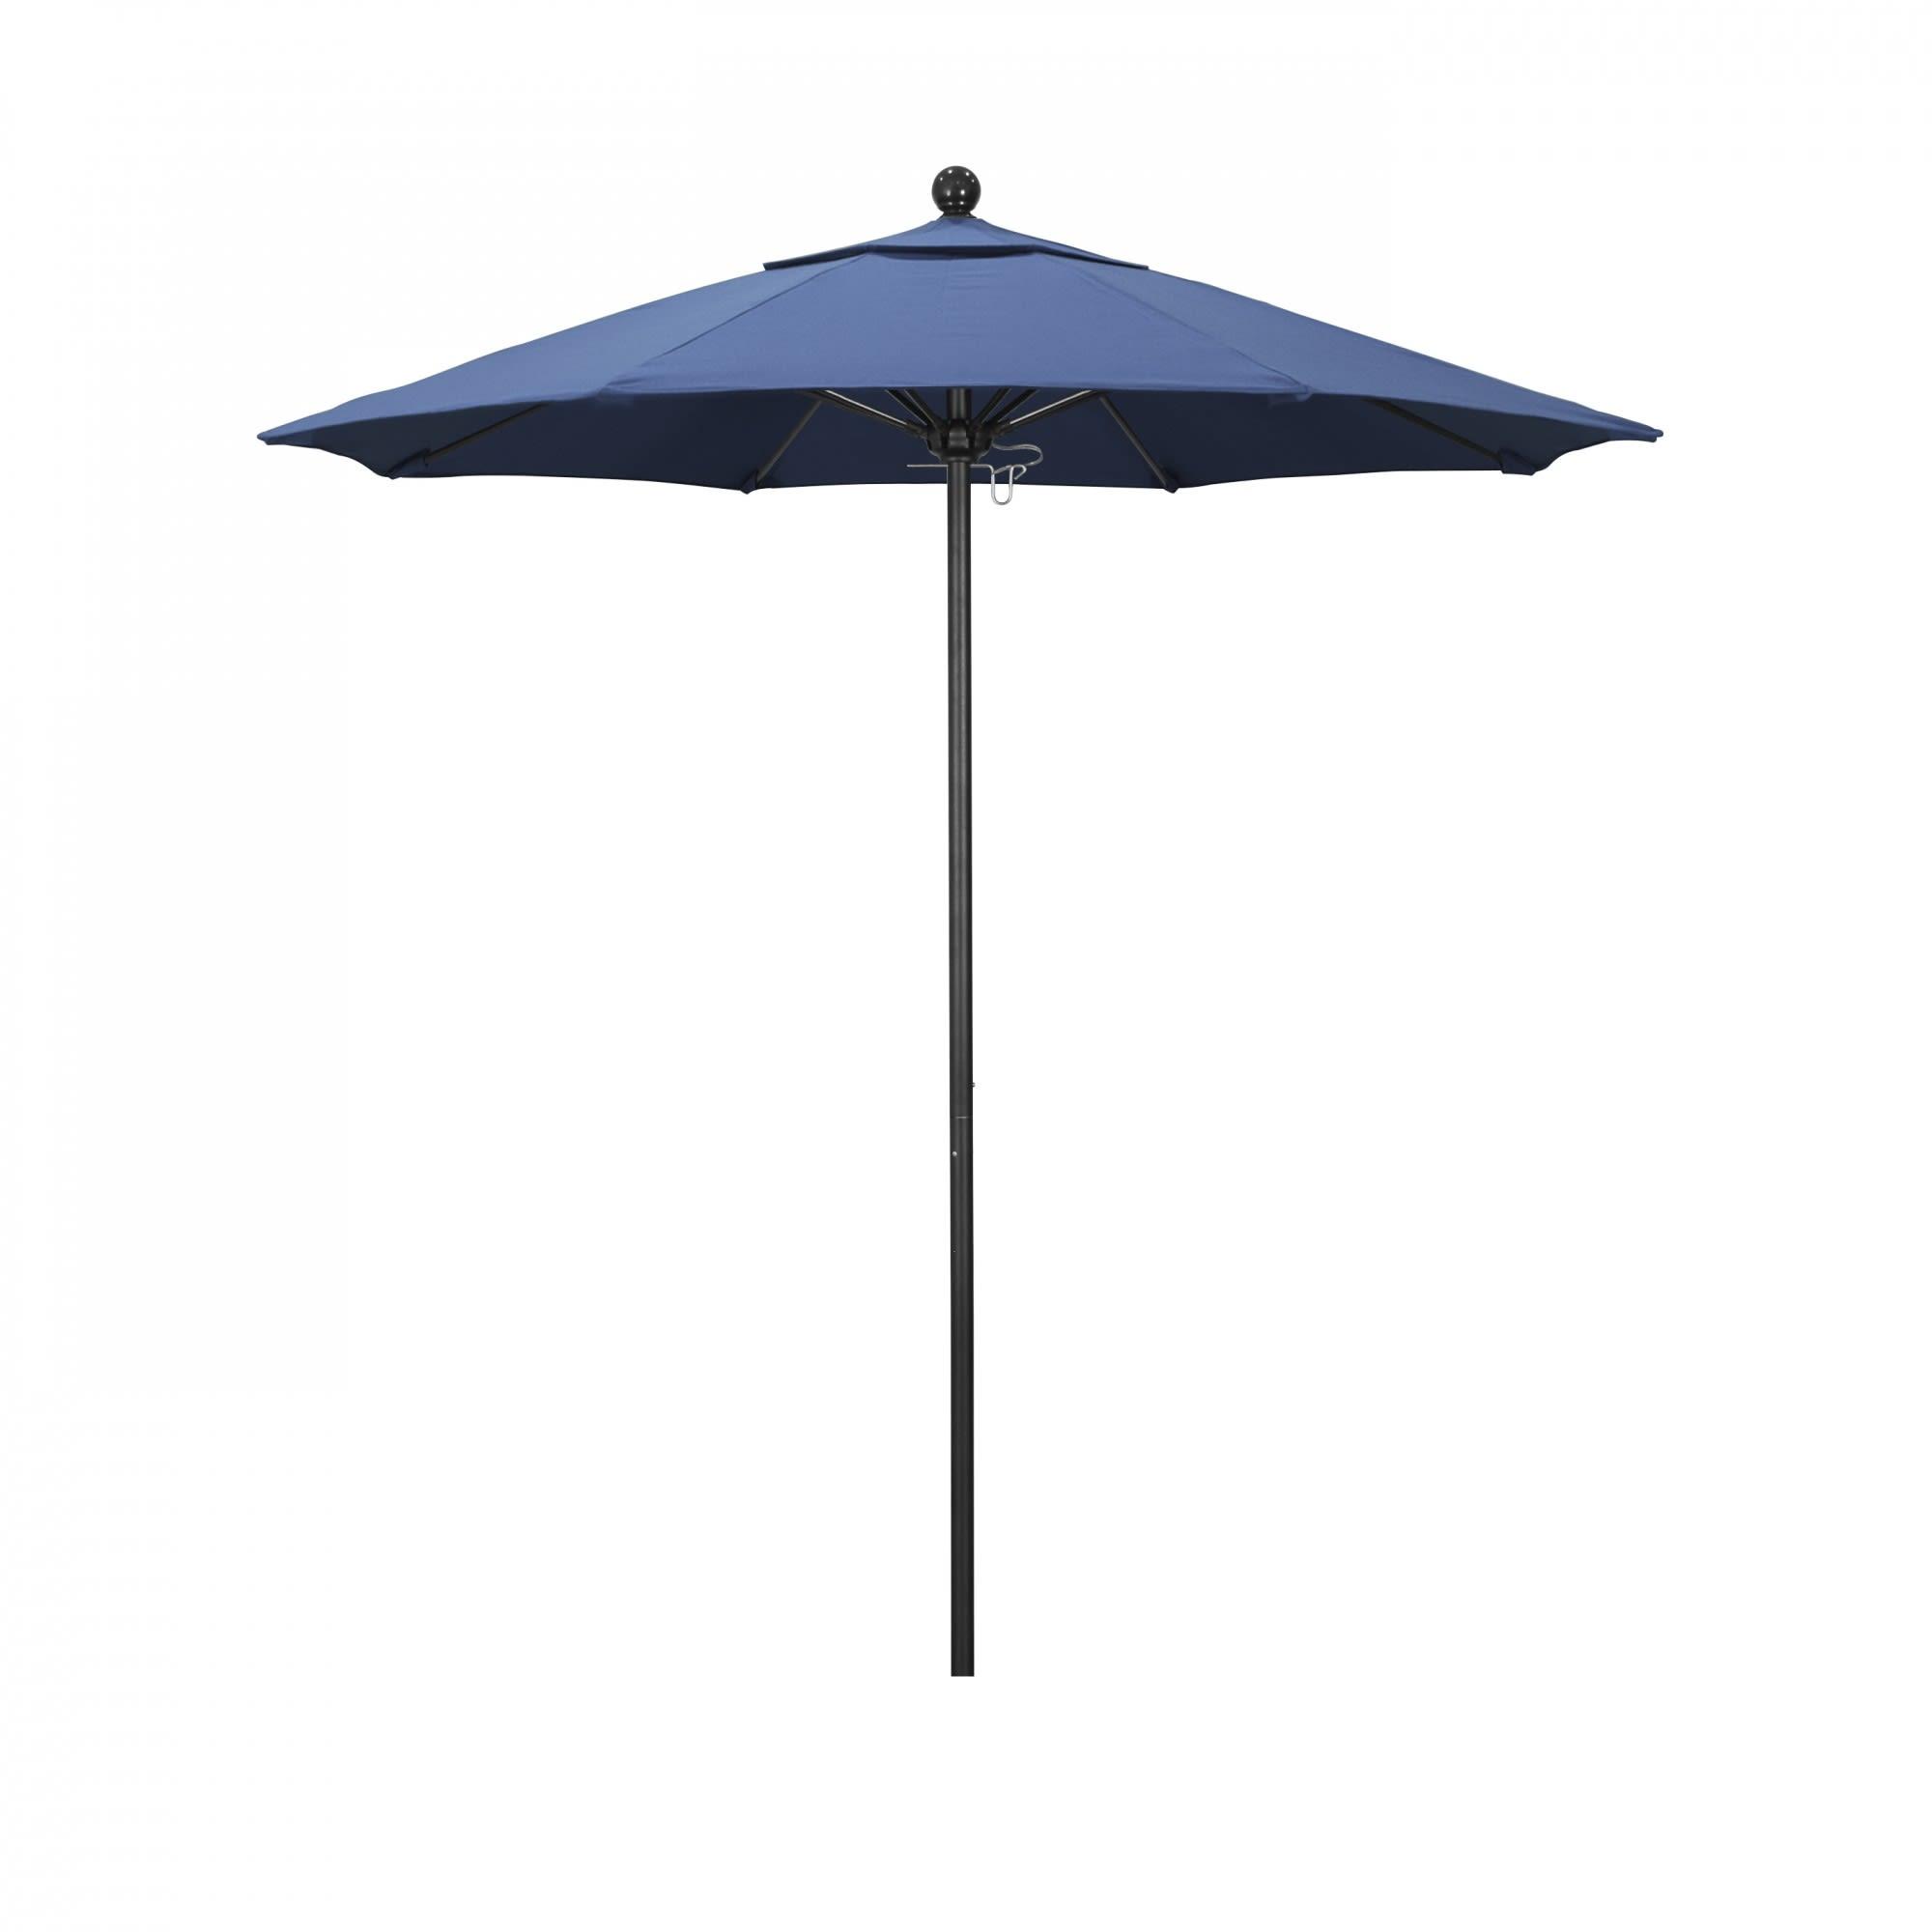 7.5 ft Casey Stone Black Aluminum Commercial Umbrella with 7.5 ft Casey Stone Black Aluminum Commercial Umbrella